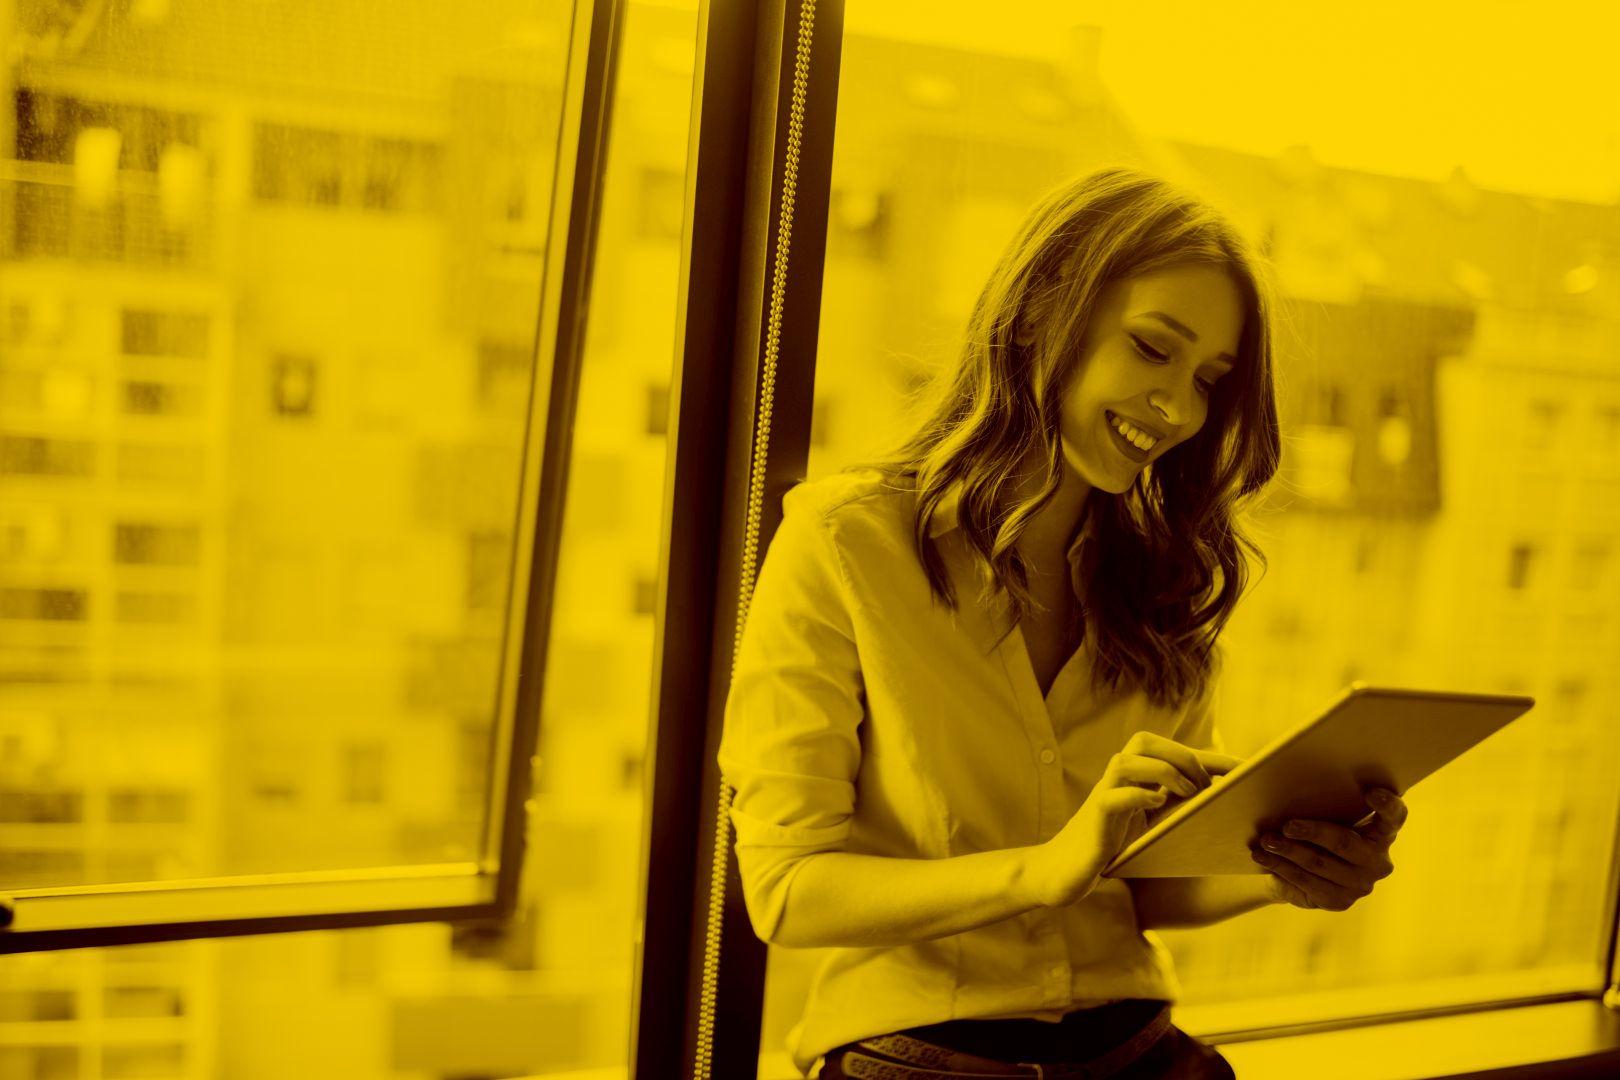 Frau nutzt Desktop as a Service auf dem Tablet in der maja.cloud